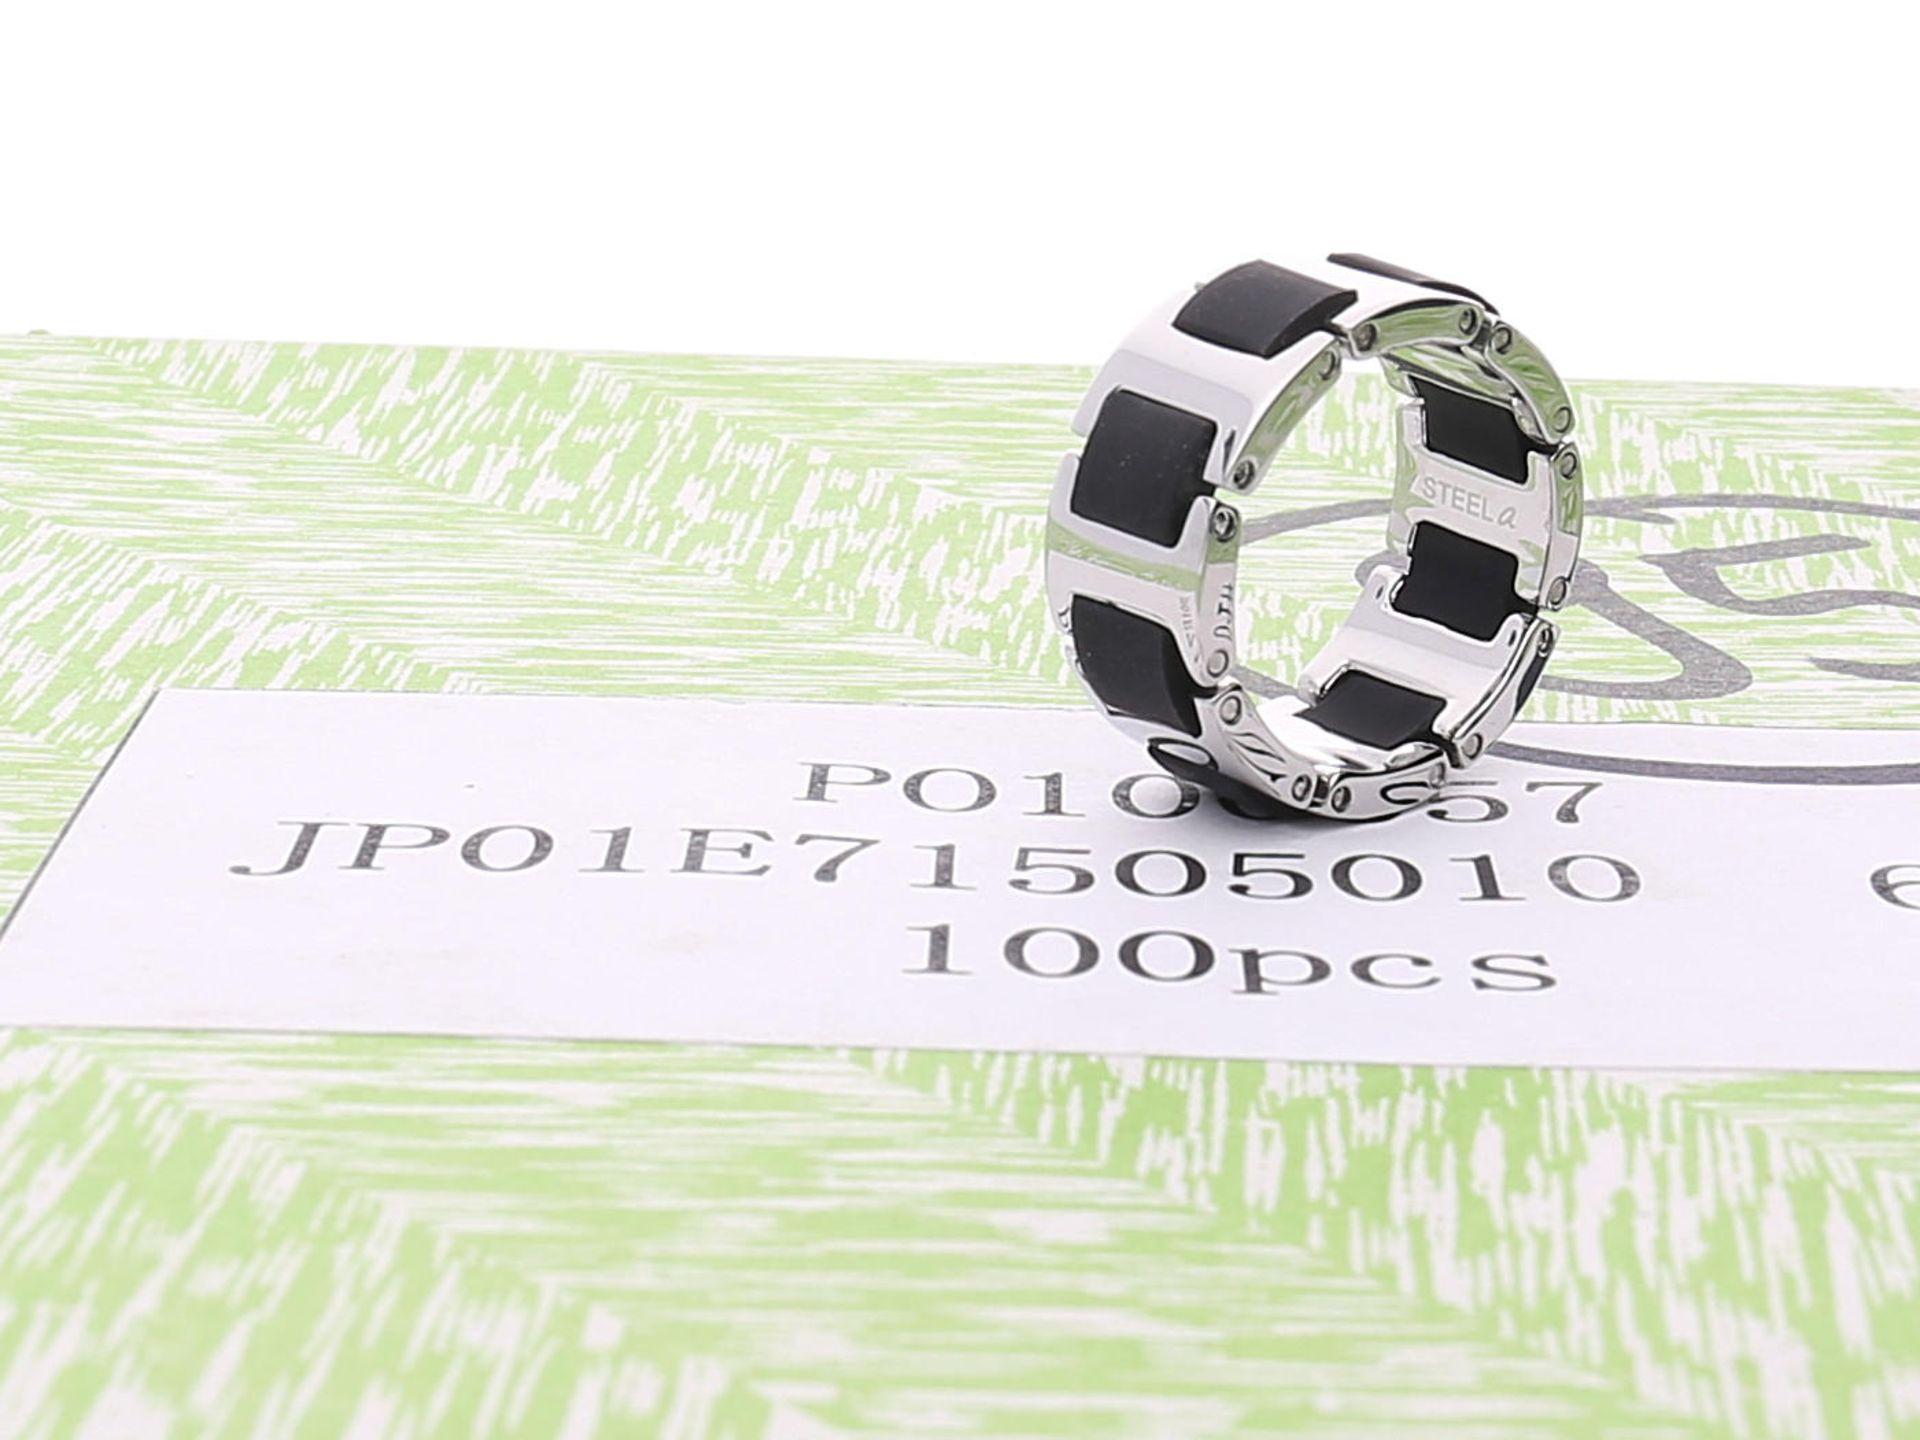 Los 6034 - Ring: neuwertige, ungetragene, originalverpackte Partie Designerringe, s.Oliver Herren-Edelstahl-